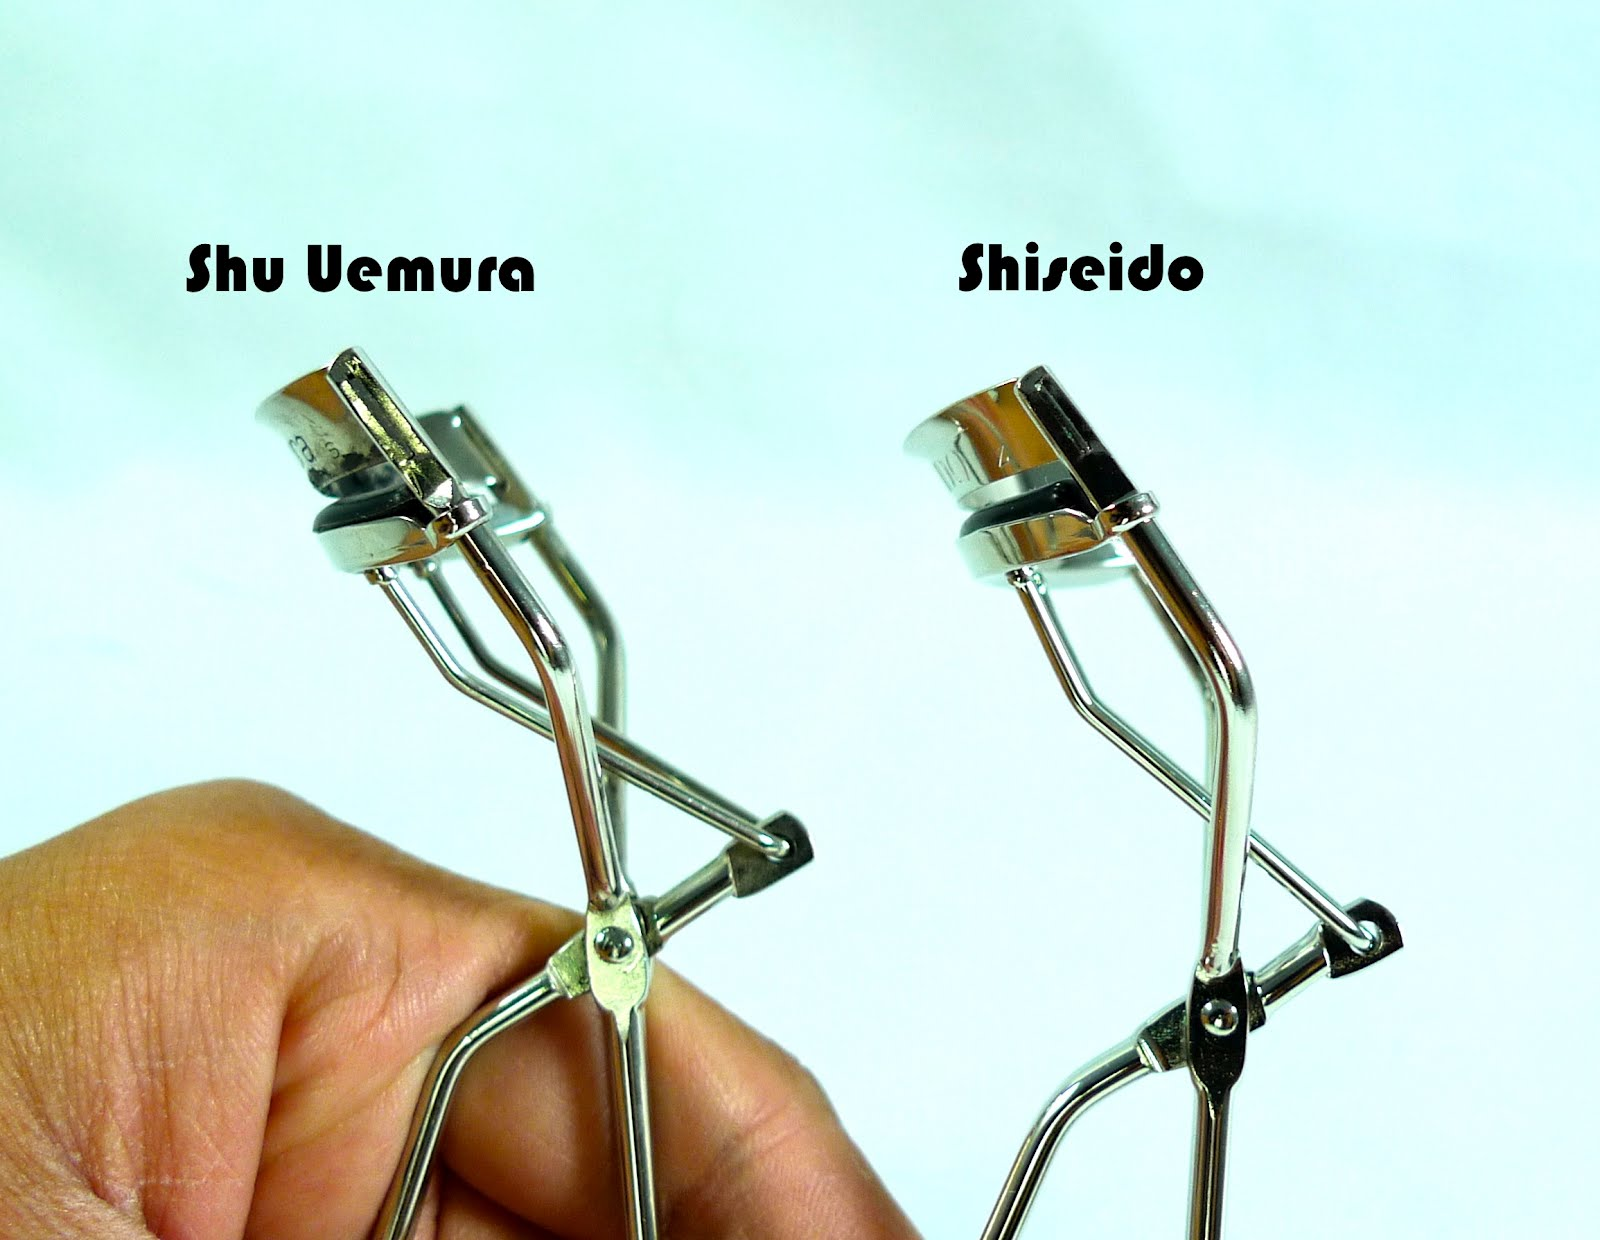 shiseido eyelash curler. body curve: shu uemura\u0027s body curve is more universal than shiseido. as you can see, it\u0027s slanted shiseido\u0027s, making it perfect for women with shiseido eyelash curler w